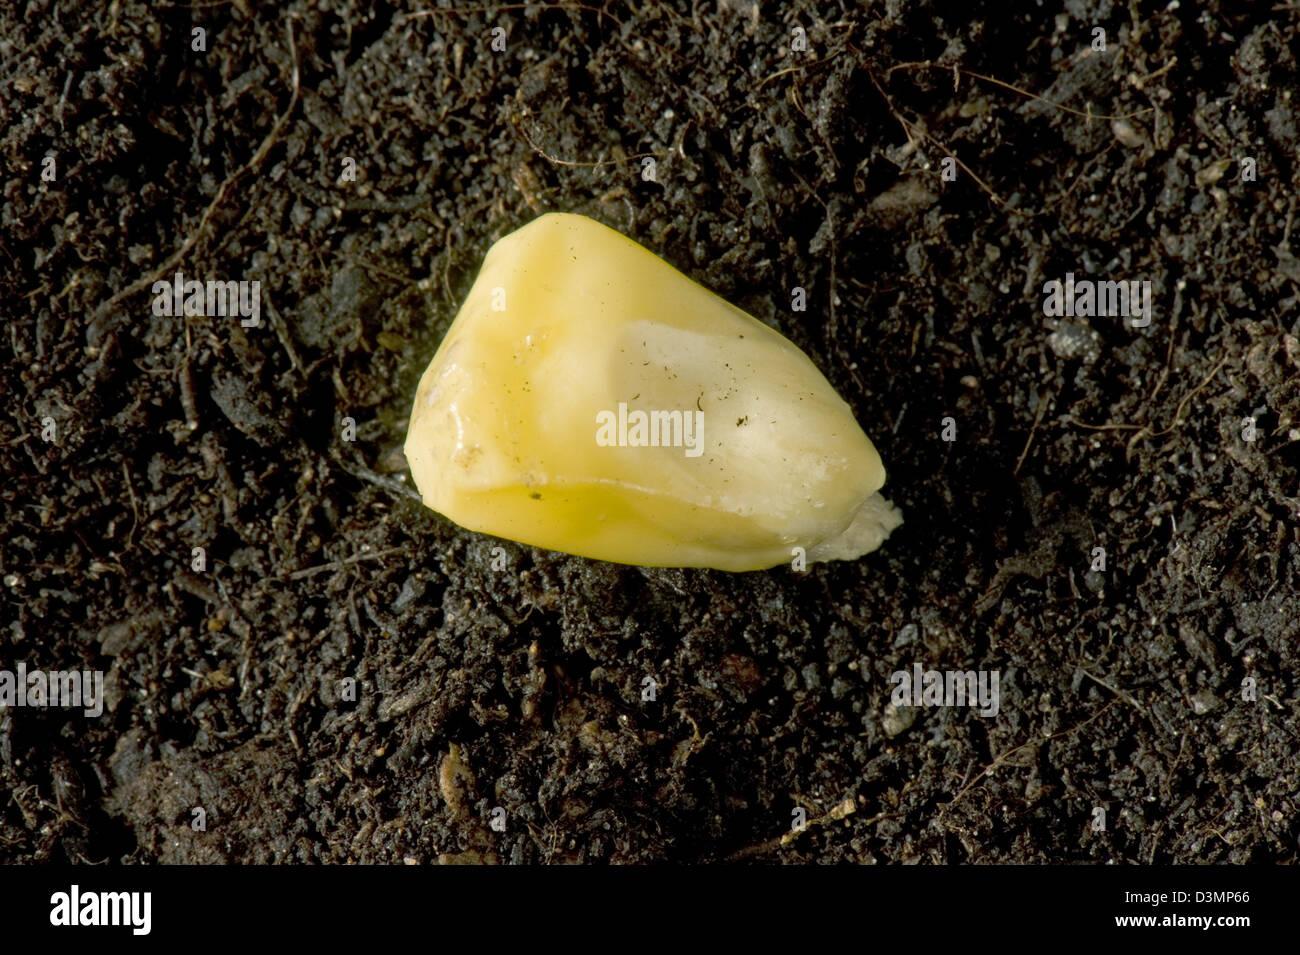 Maize, corn or sweet corn seed, Zea mays, on soil - Stock Image